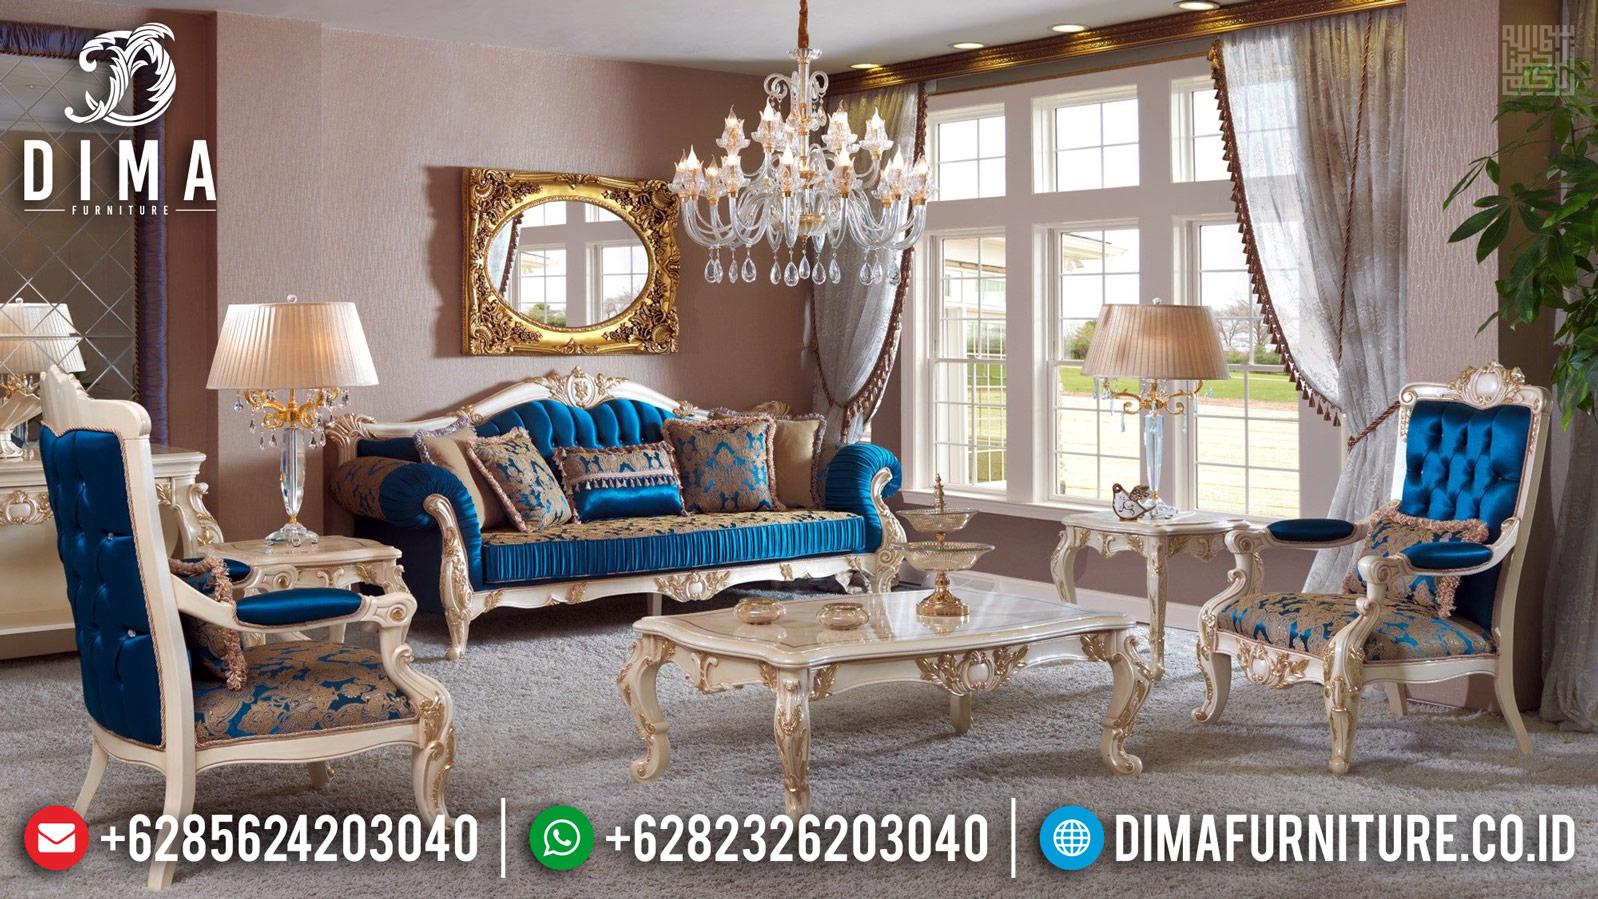 Sale Sofa Tamu Mewah Jepara Classic Koltuk Duco White Pearl Gold DF-1190